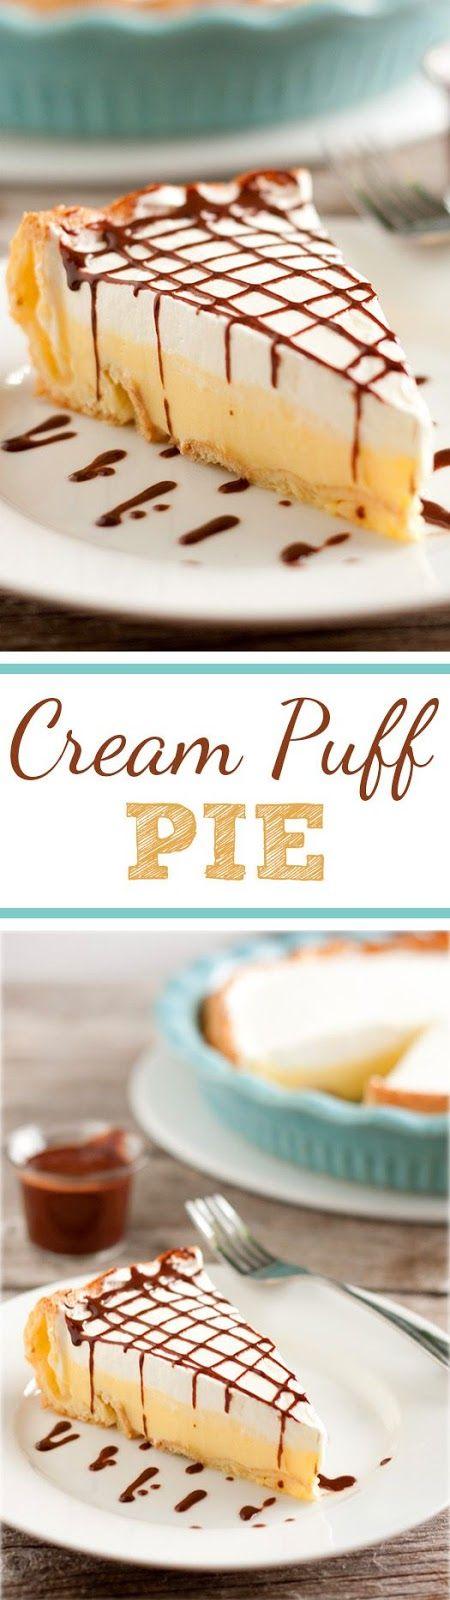 Cream Puff Pie (aka cream puff cake or eclair cake) | Food And Cake Recipes